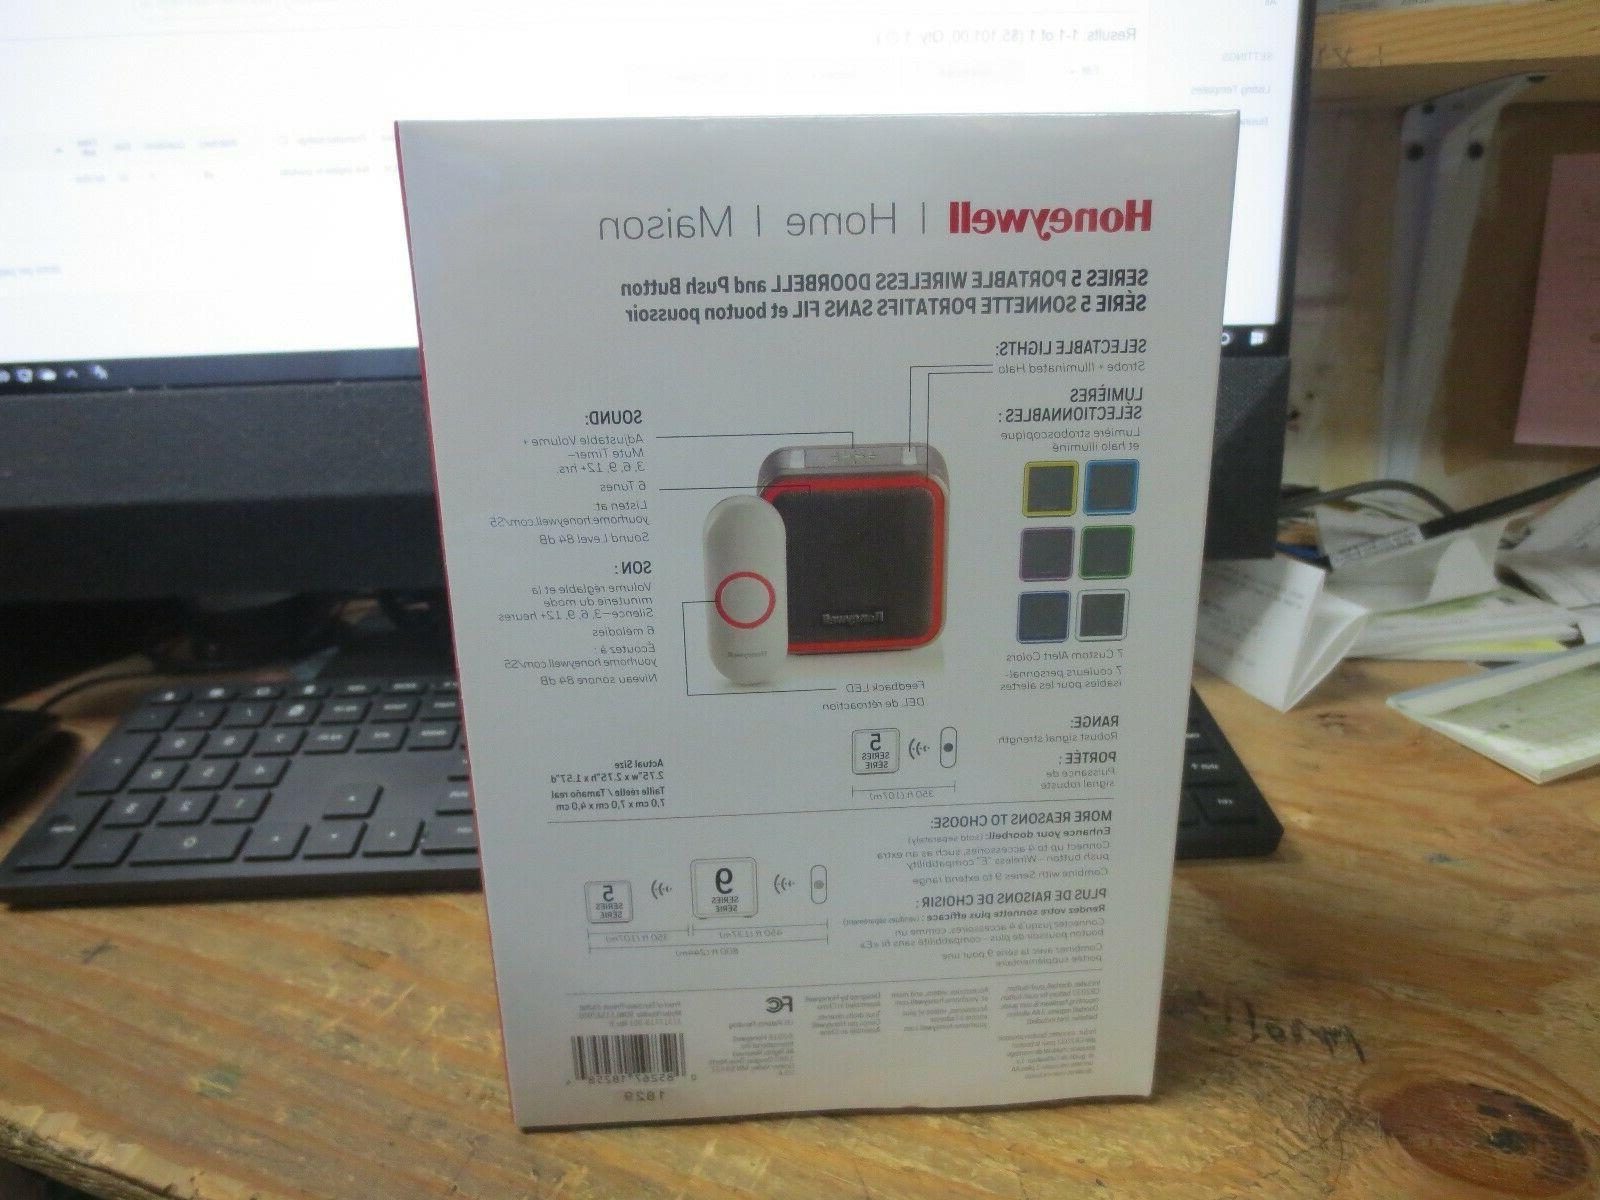 Honeywell RDWL515A Wireless Doorbell In Box!